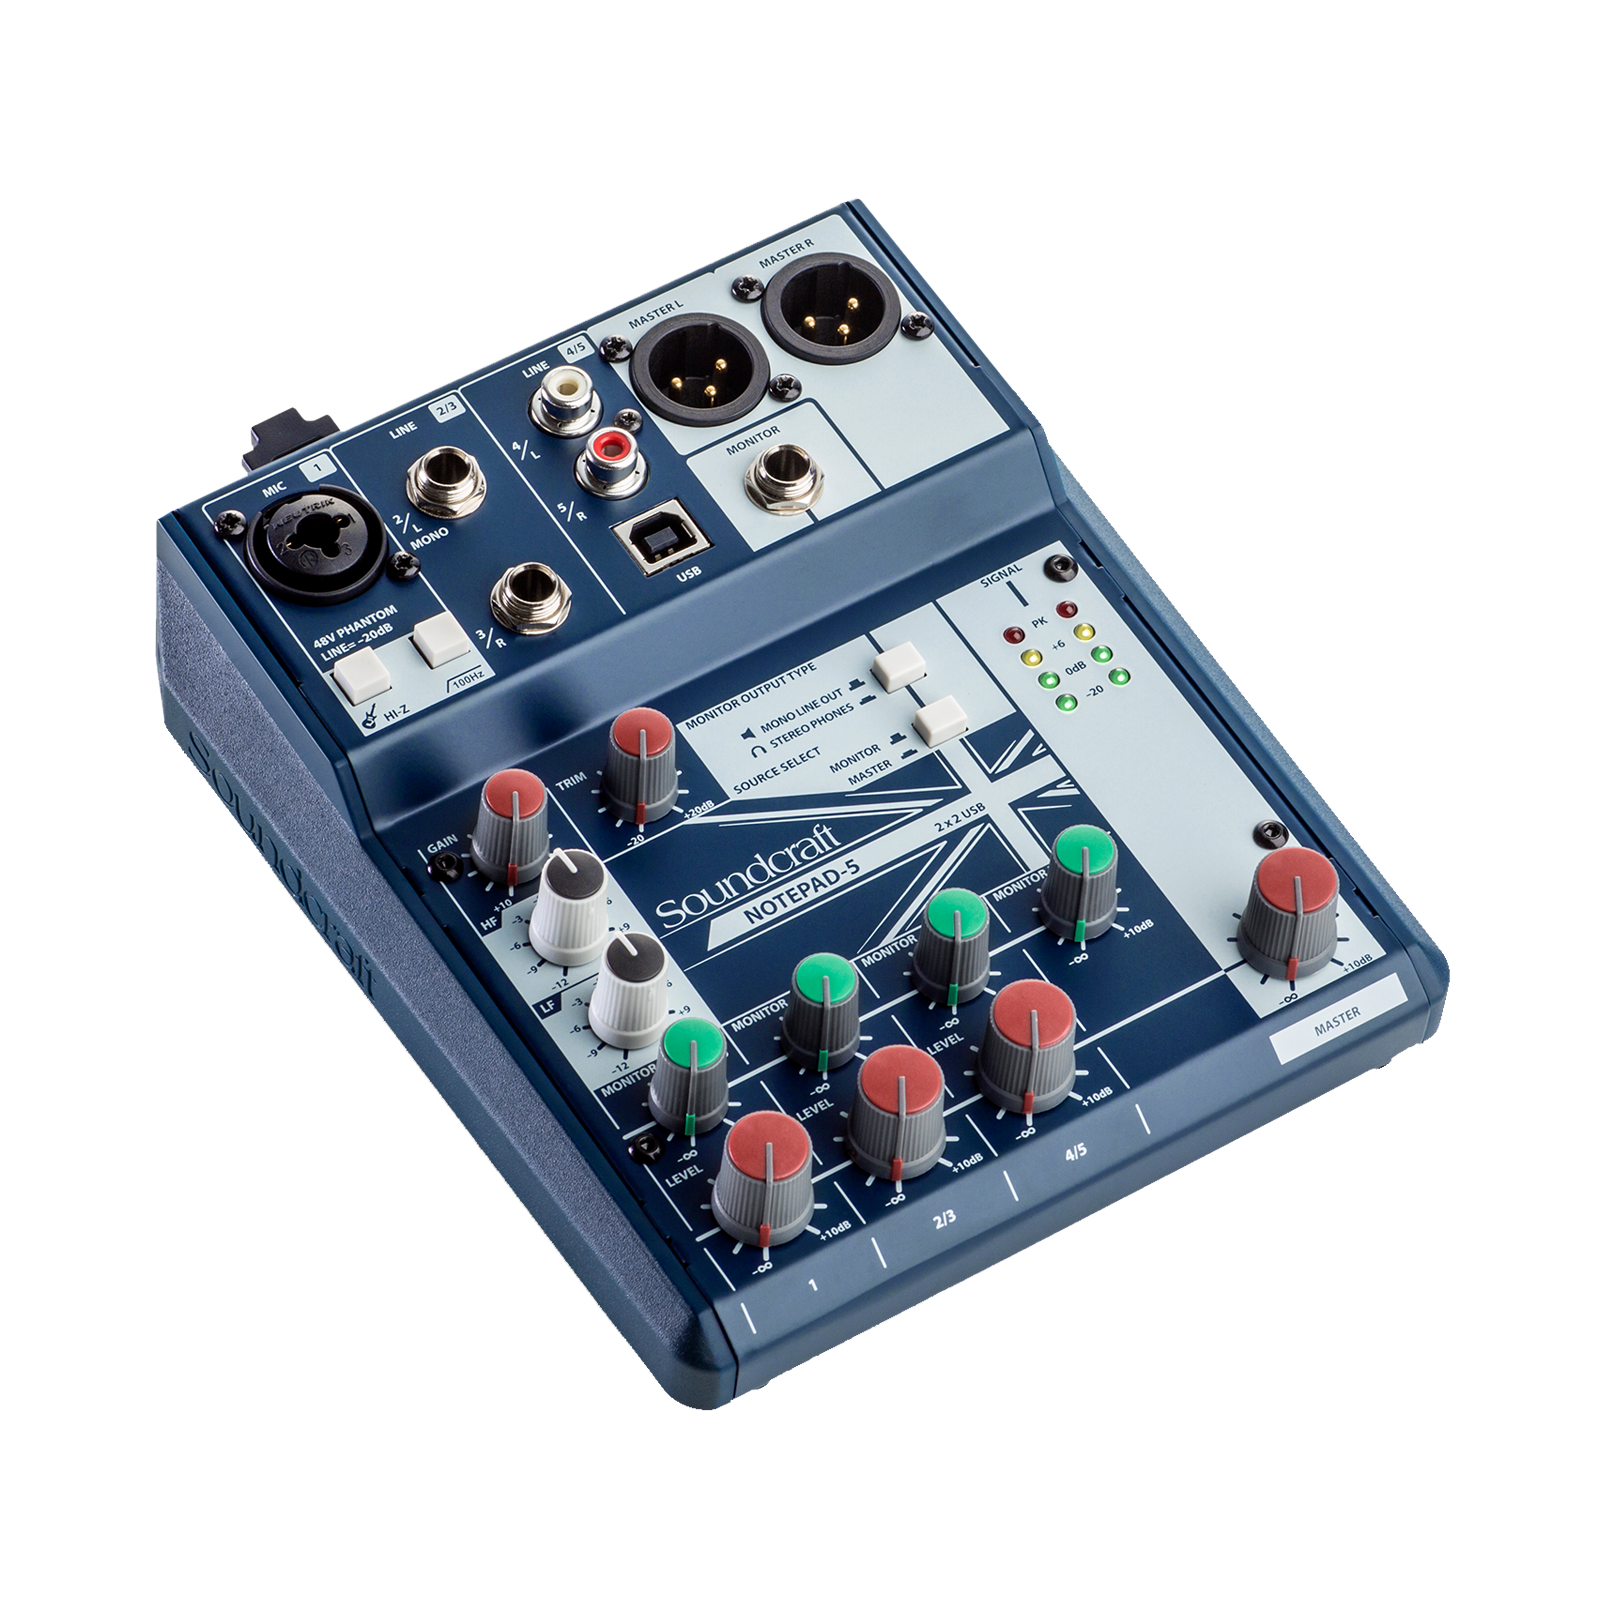 Notepad-5 - Dark Blue - Small-format analog mixing console with USB I/O - Hero